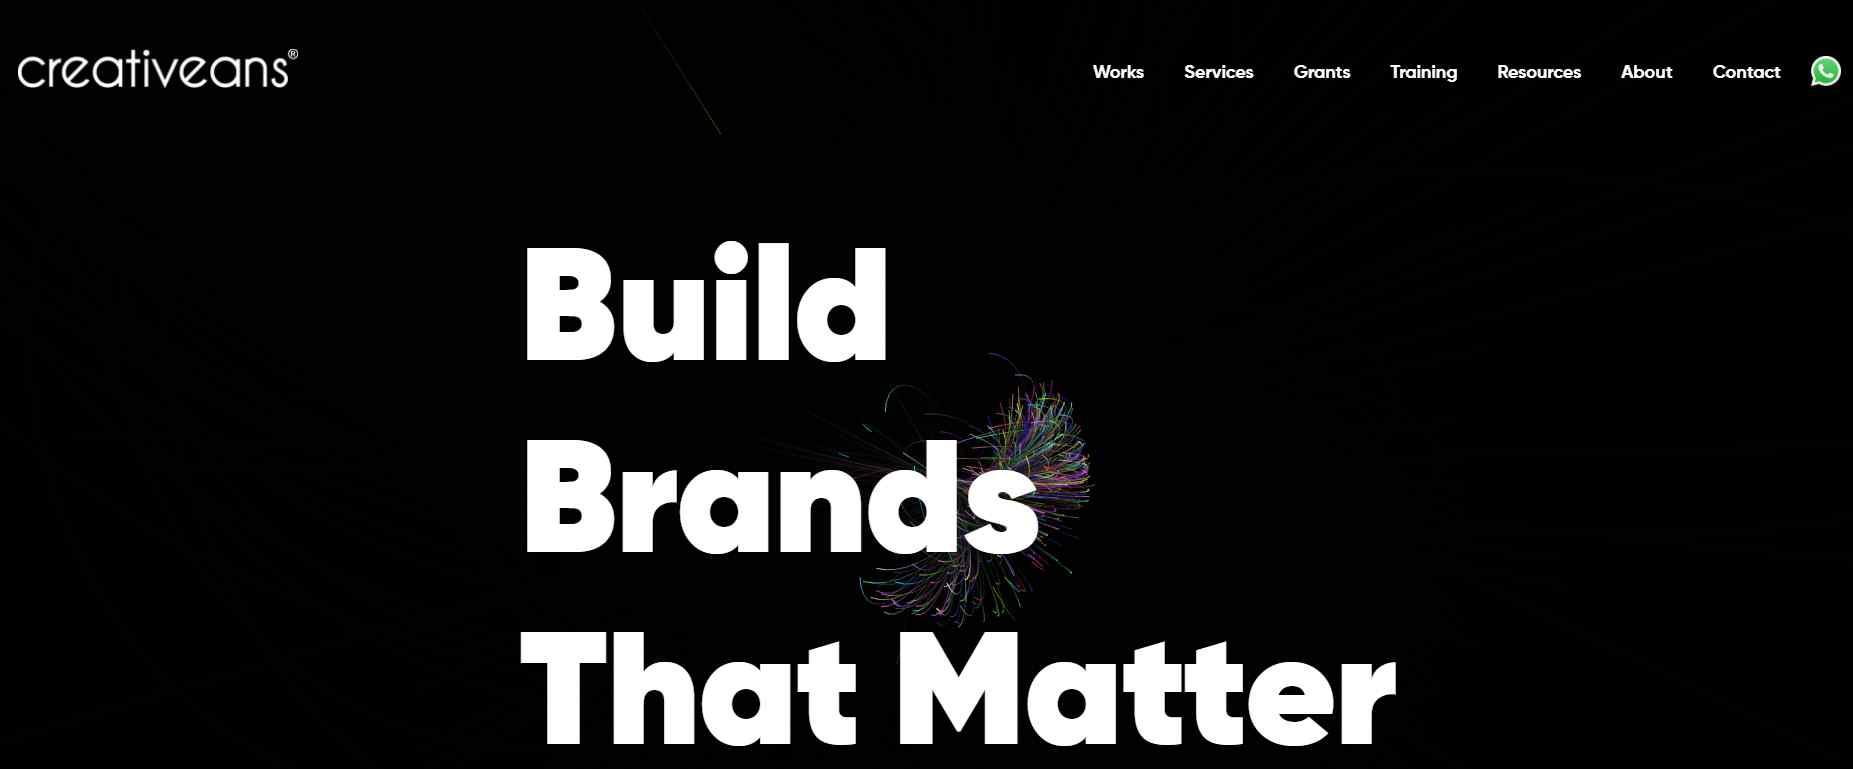 creativeans Top UX Design Service Providers in Singapore